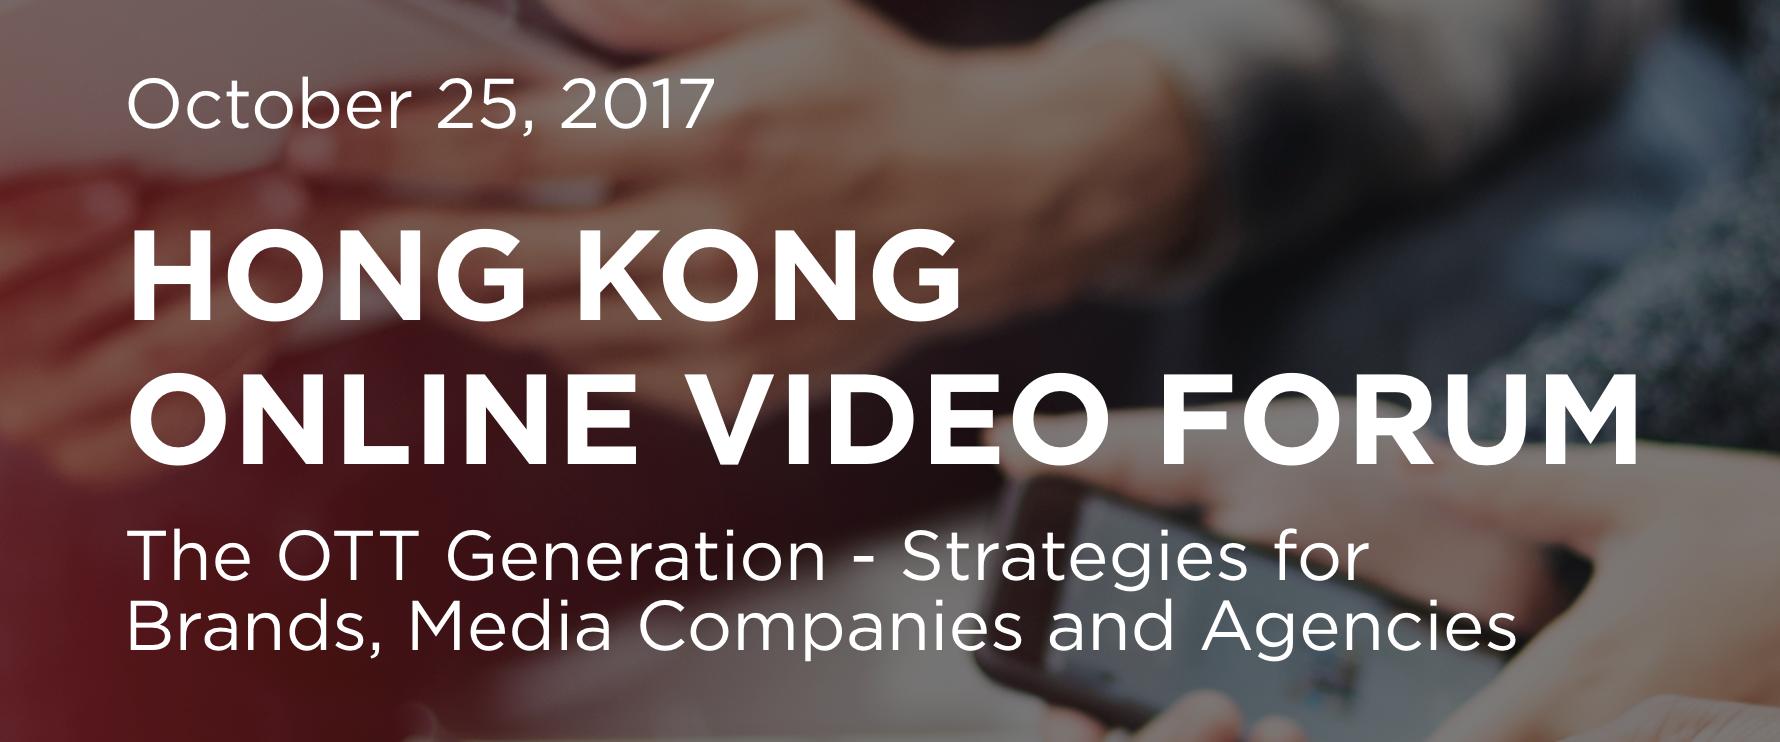 yougov | hong kong online video forum